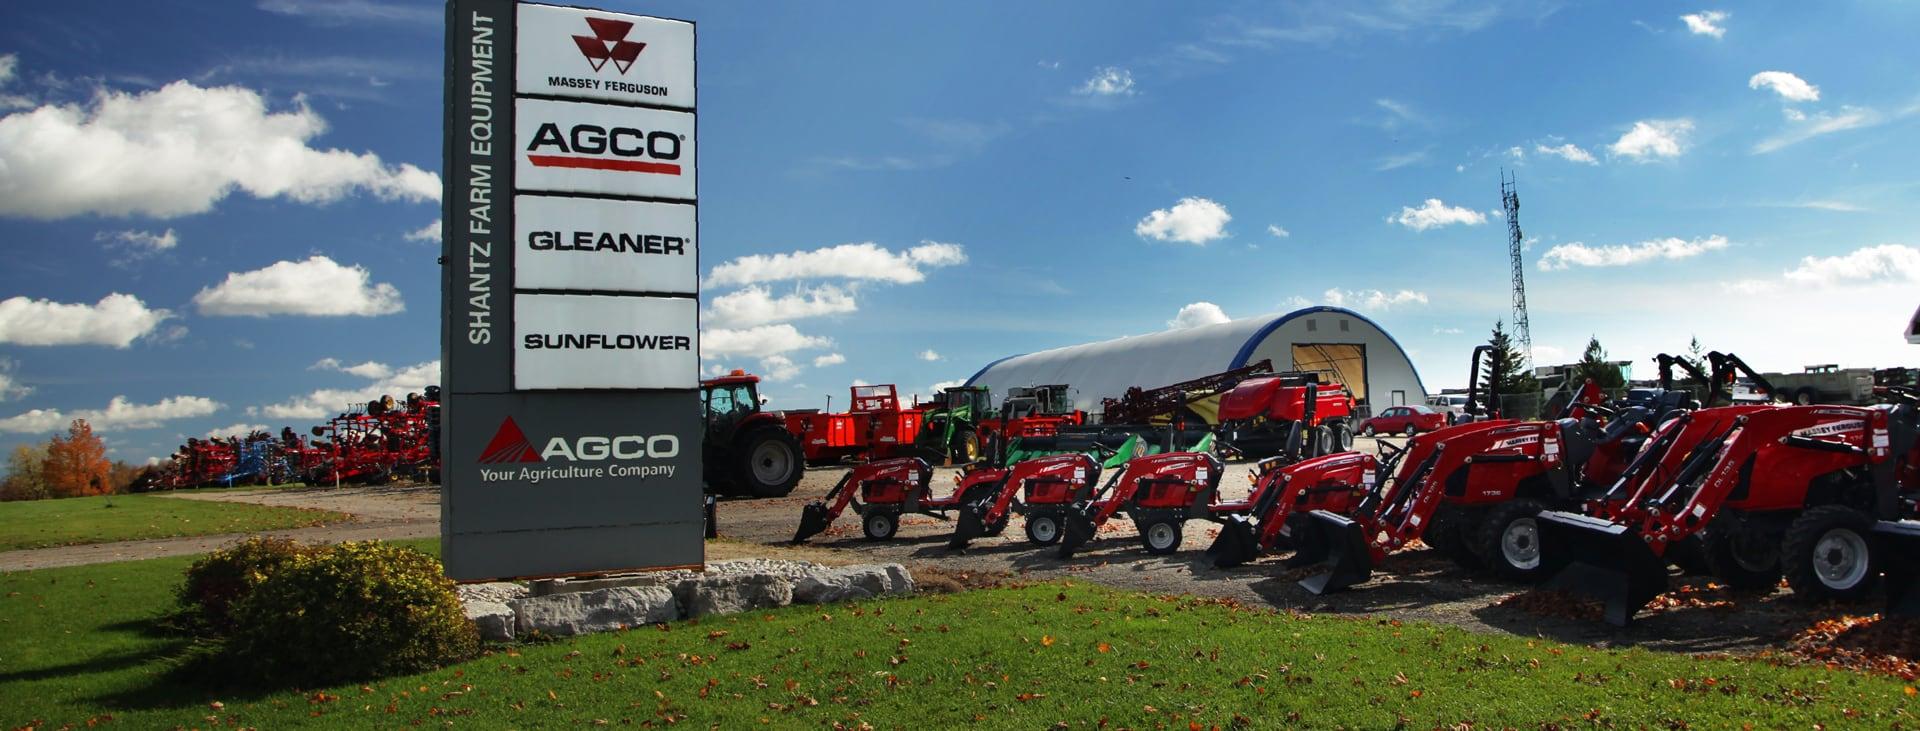 Shantz Farm Equipment | AGCO Dealer, Gleaner Combines, Parts, Salvage